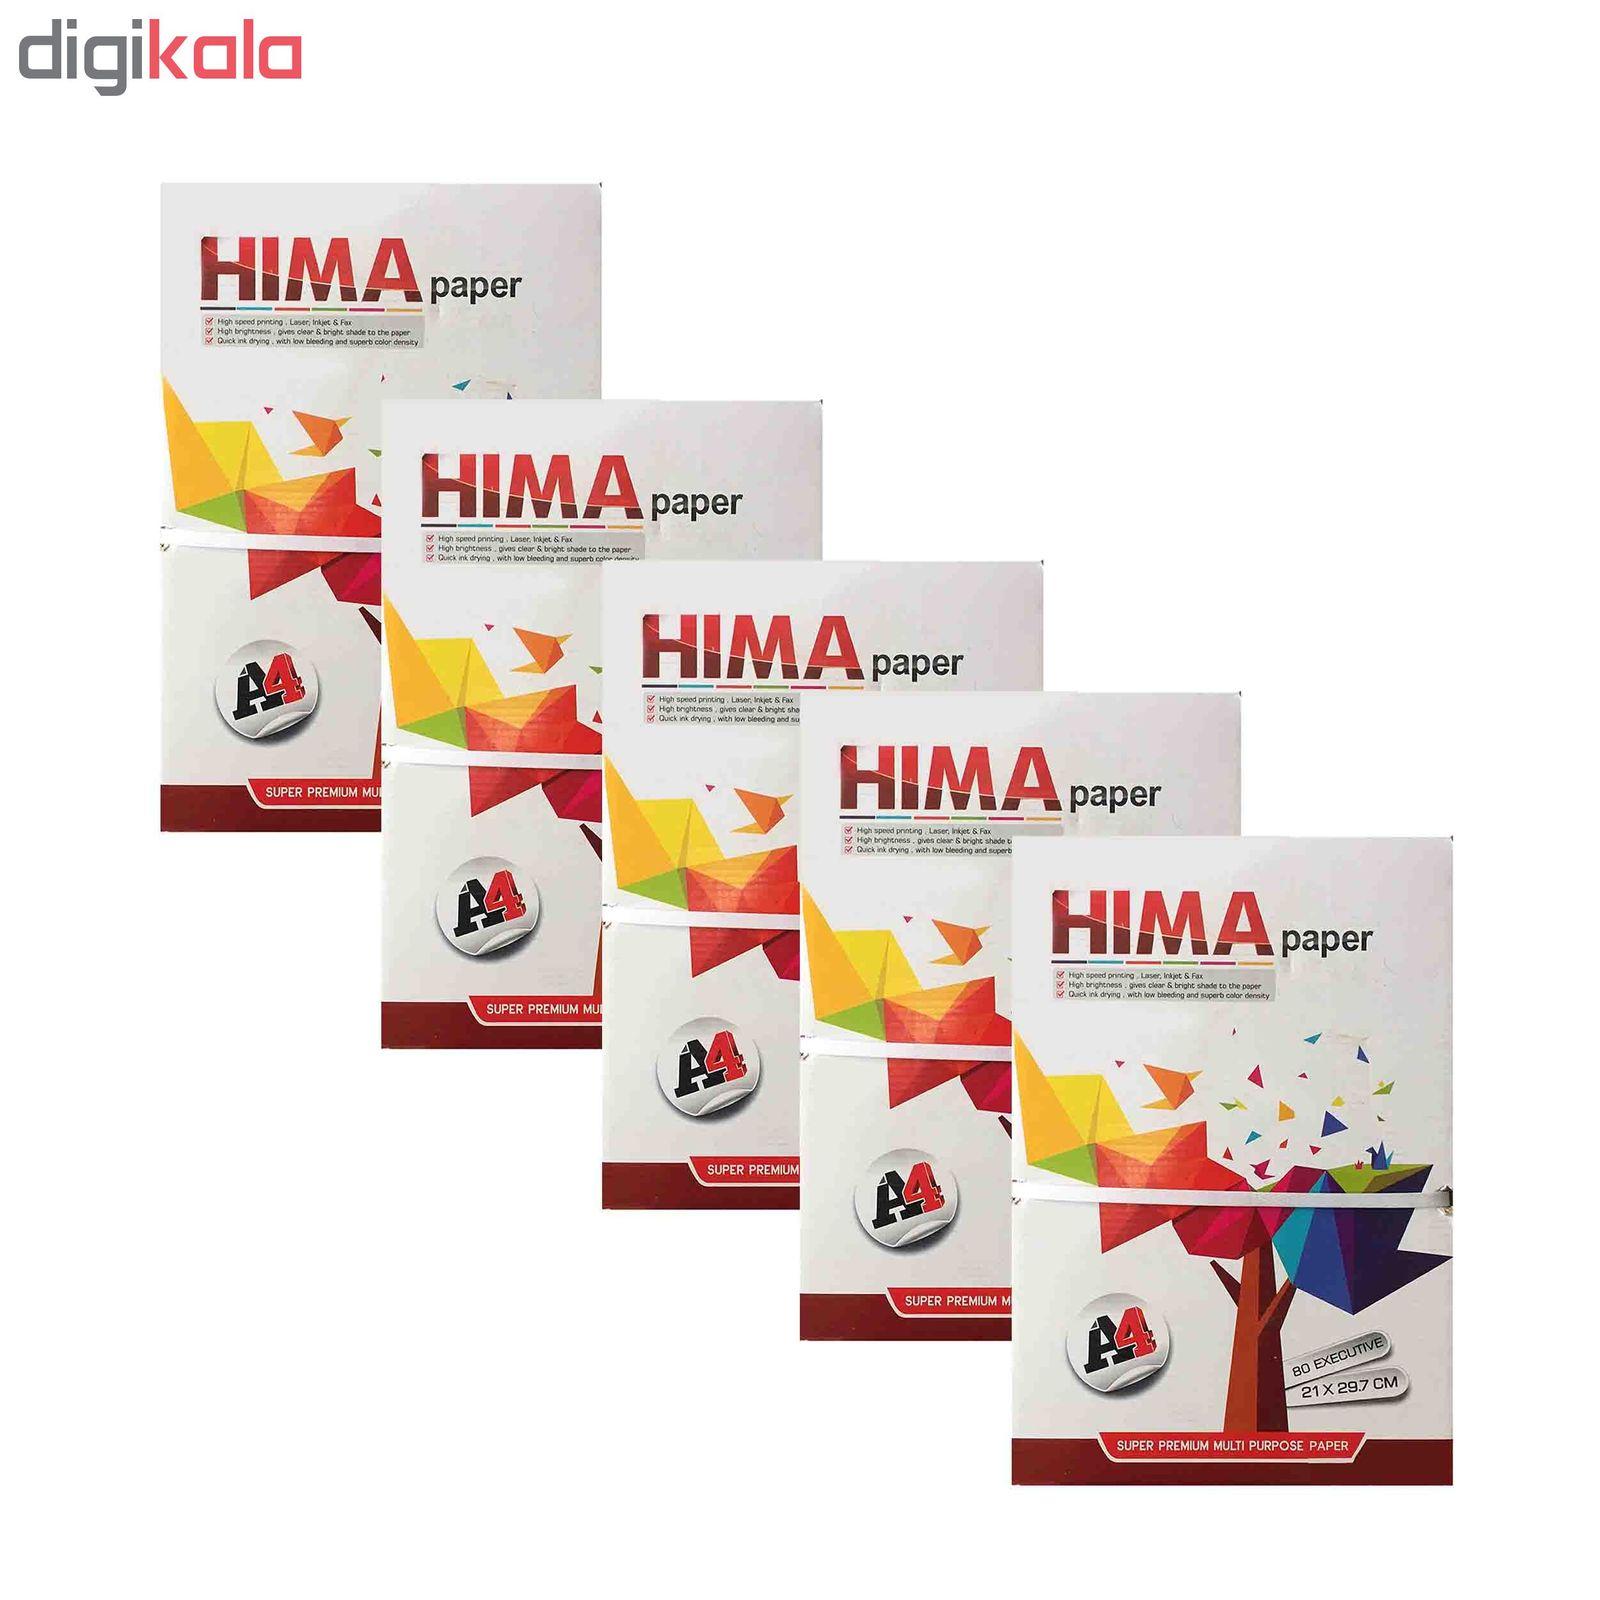 کاغذ A4 هیما کد H05 بسته 5 عددی main 1 1